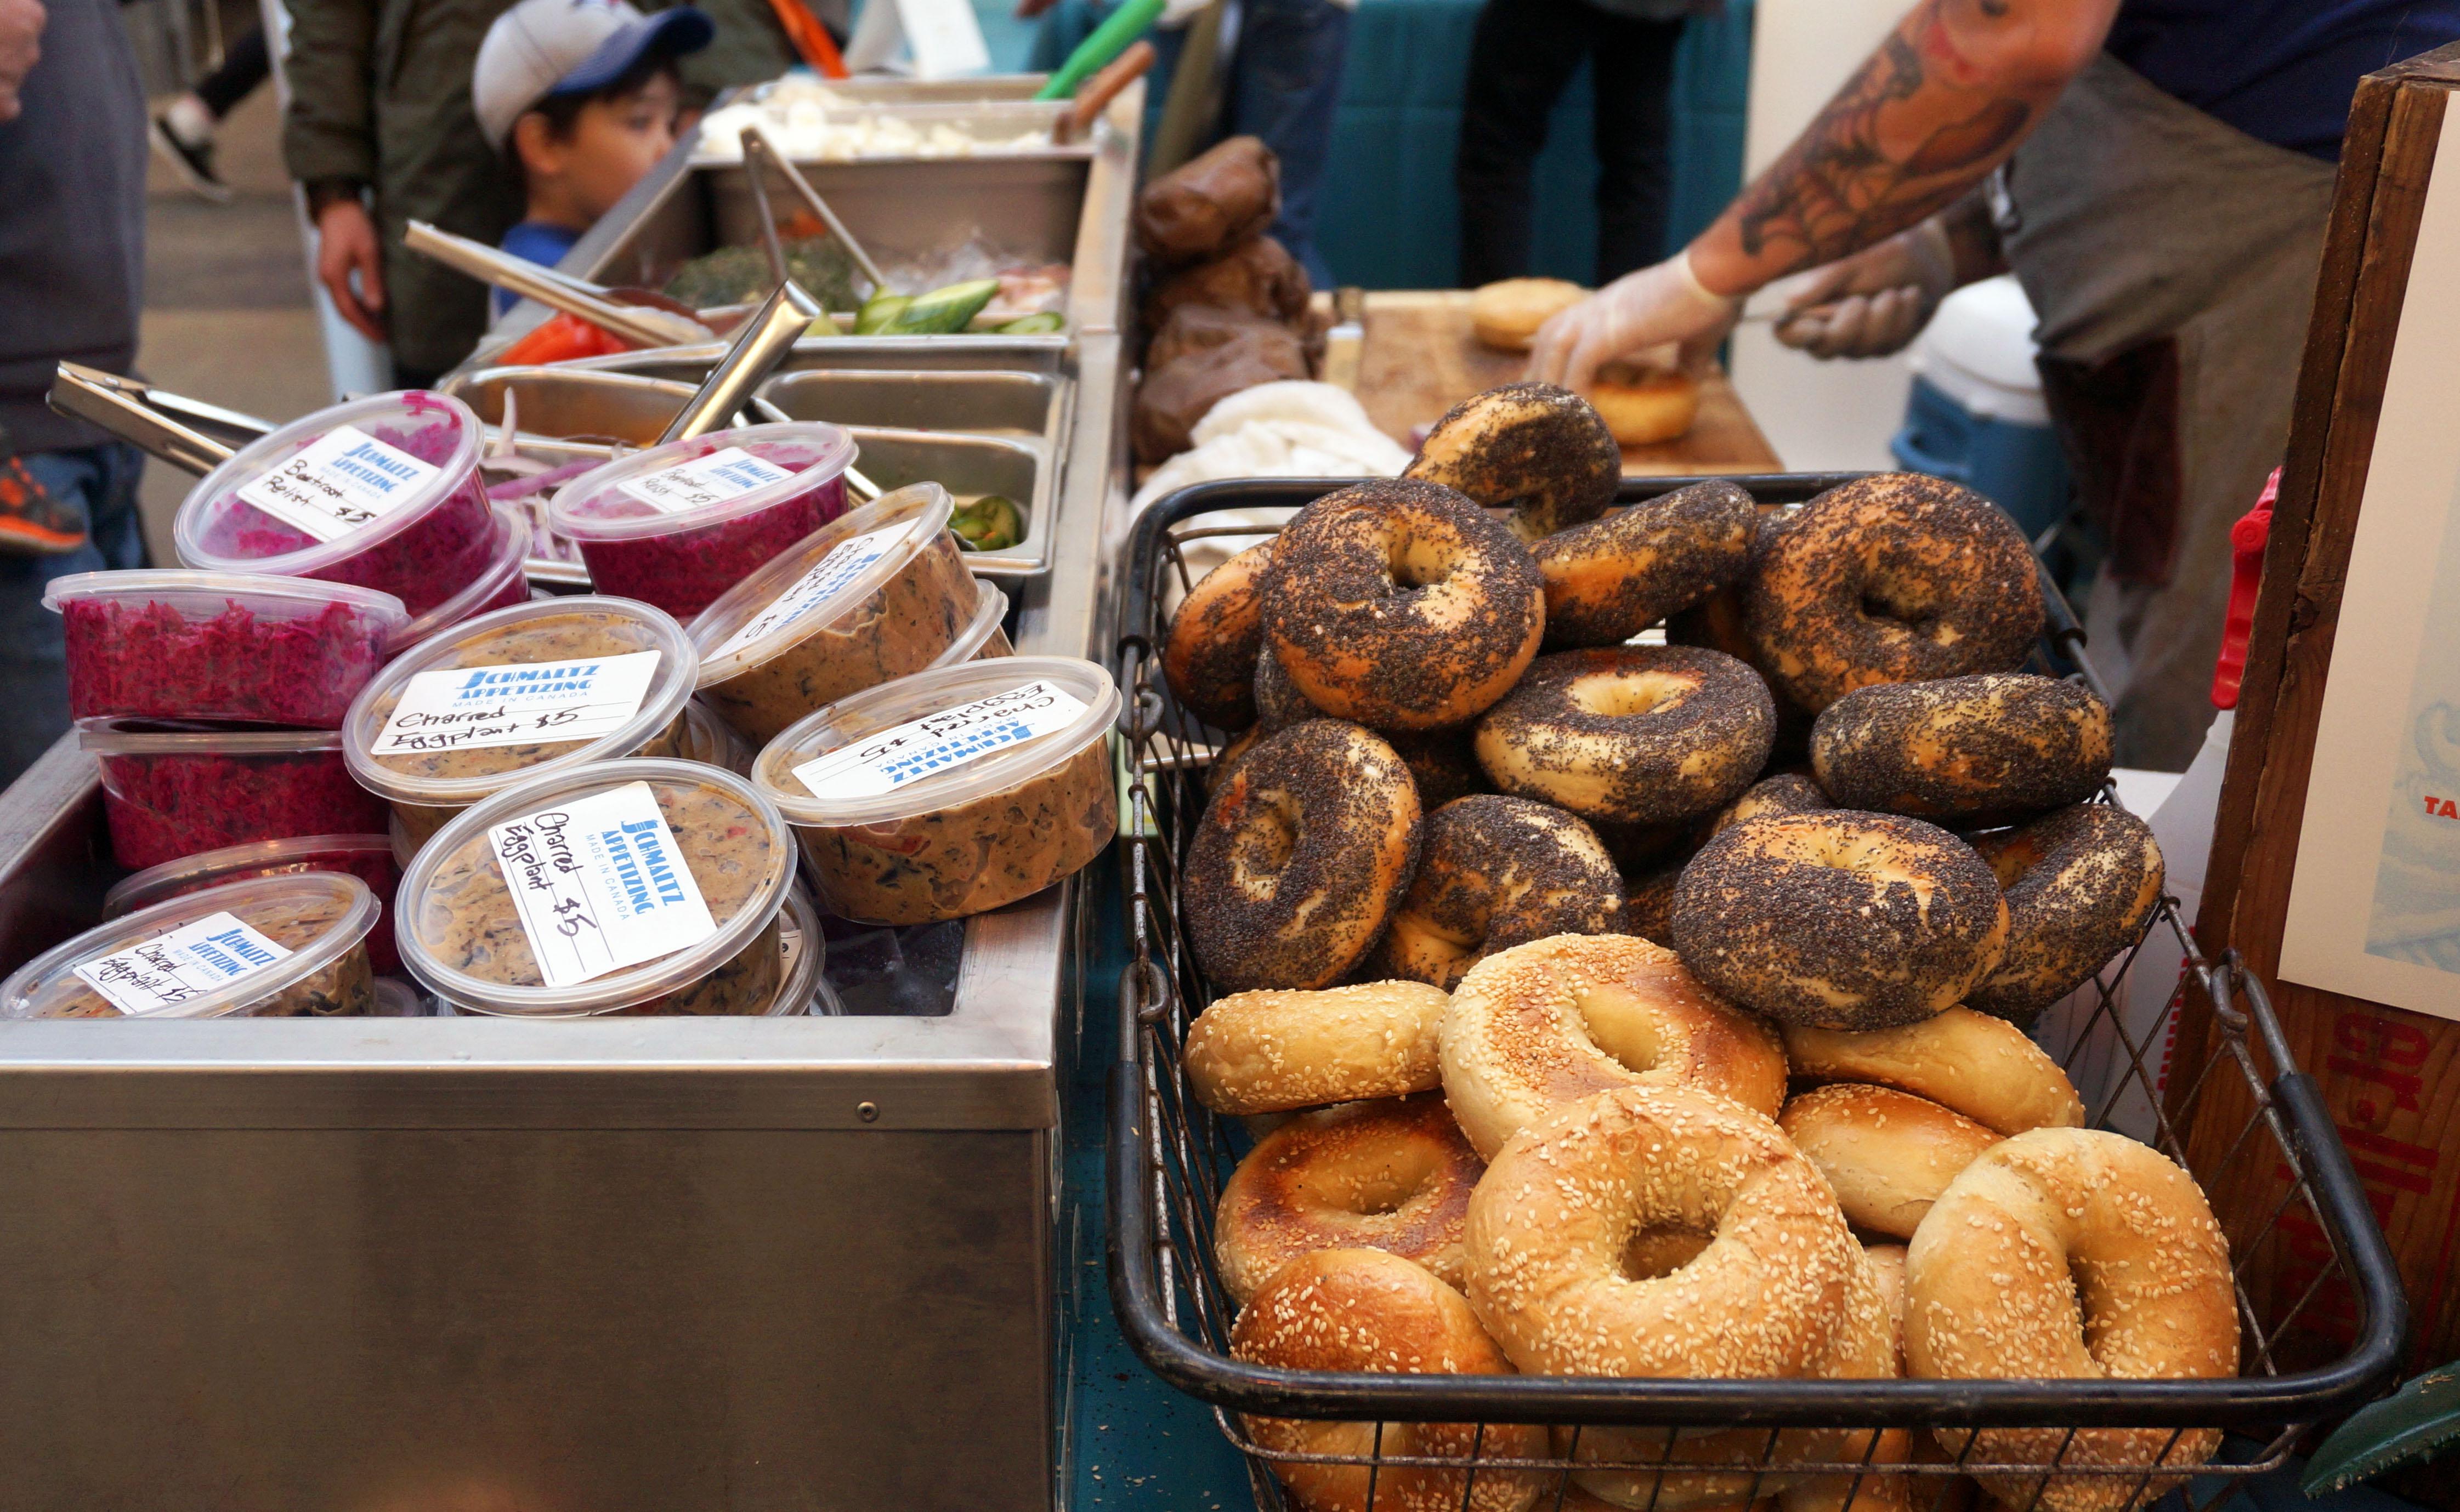 NoshFest: Toronto's Jewish Food Festival | PHOTO ESSAY